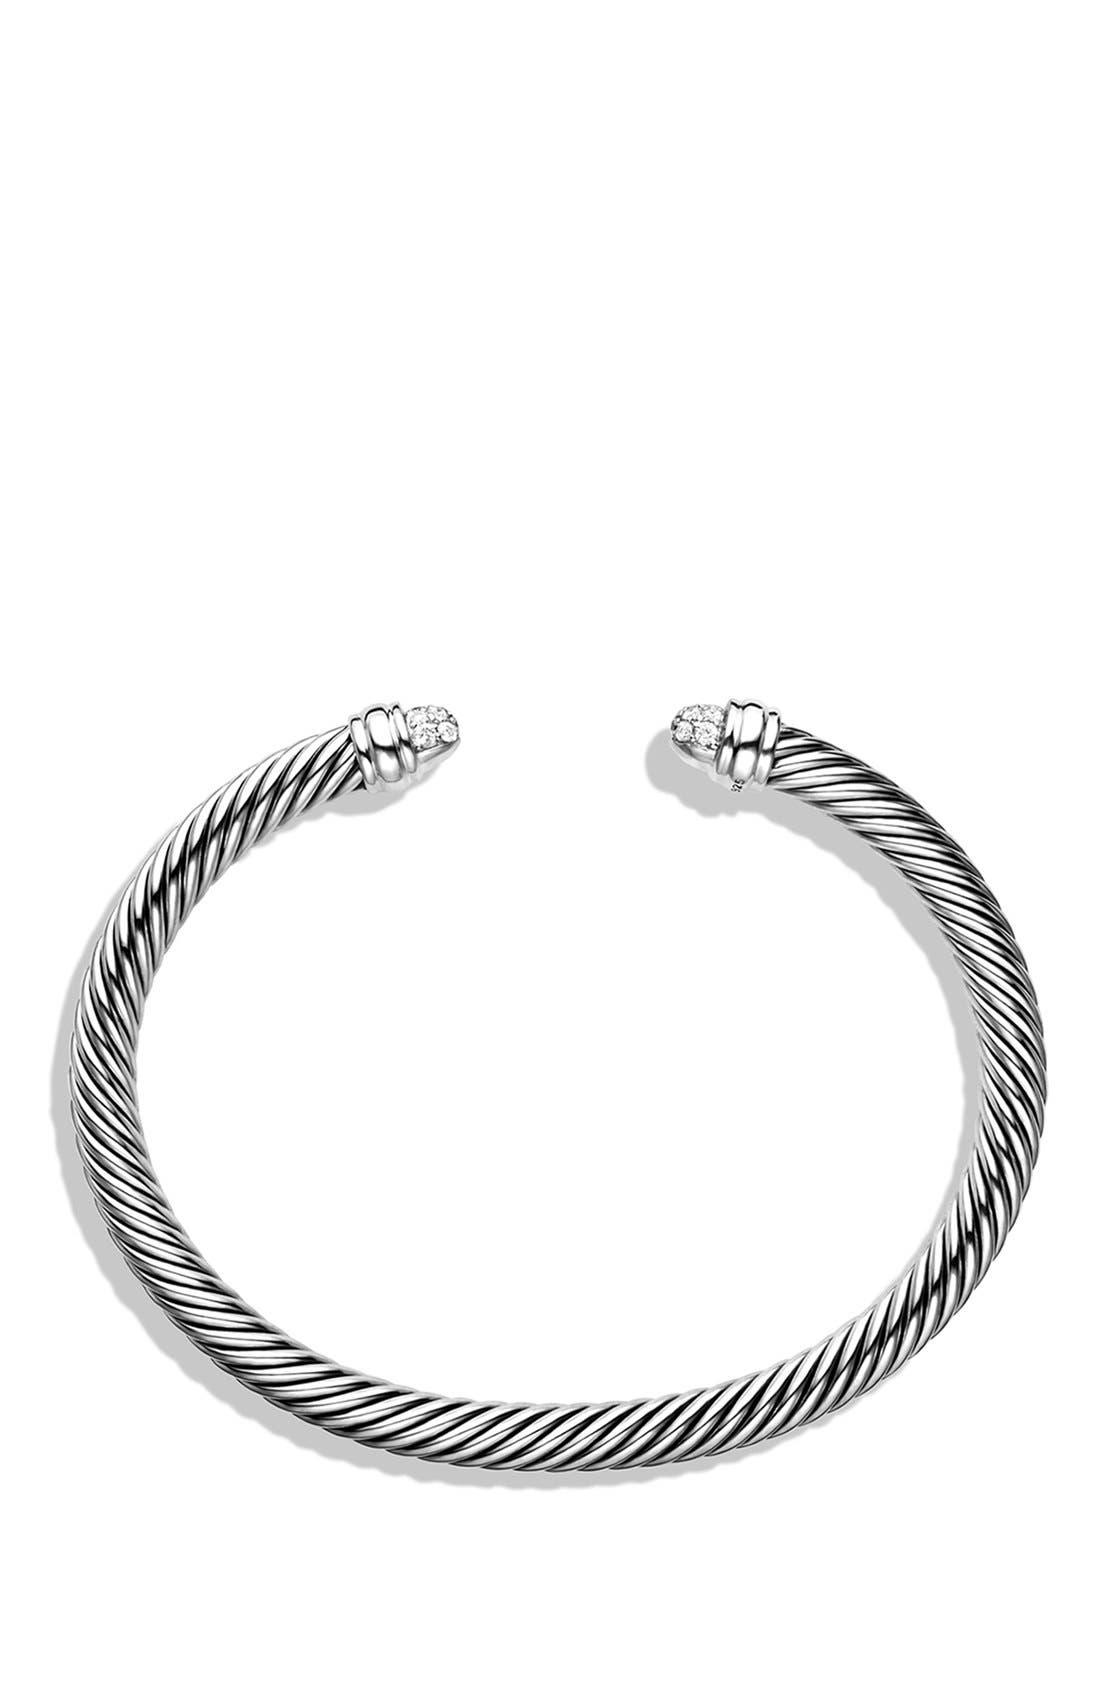 Cable Classics Bracelet with Diamonds, 5mm,                             Alternate thumbnail 2, color,                             Diamond